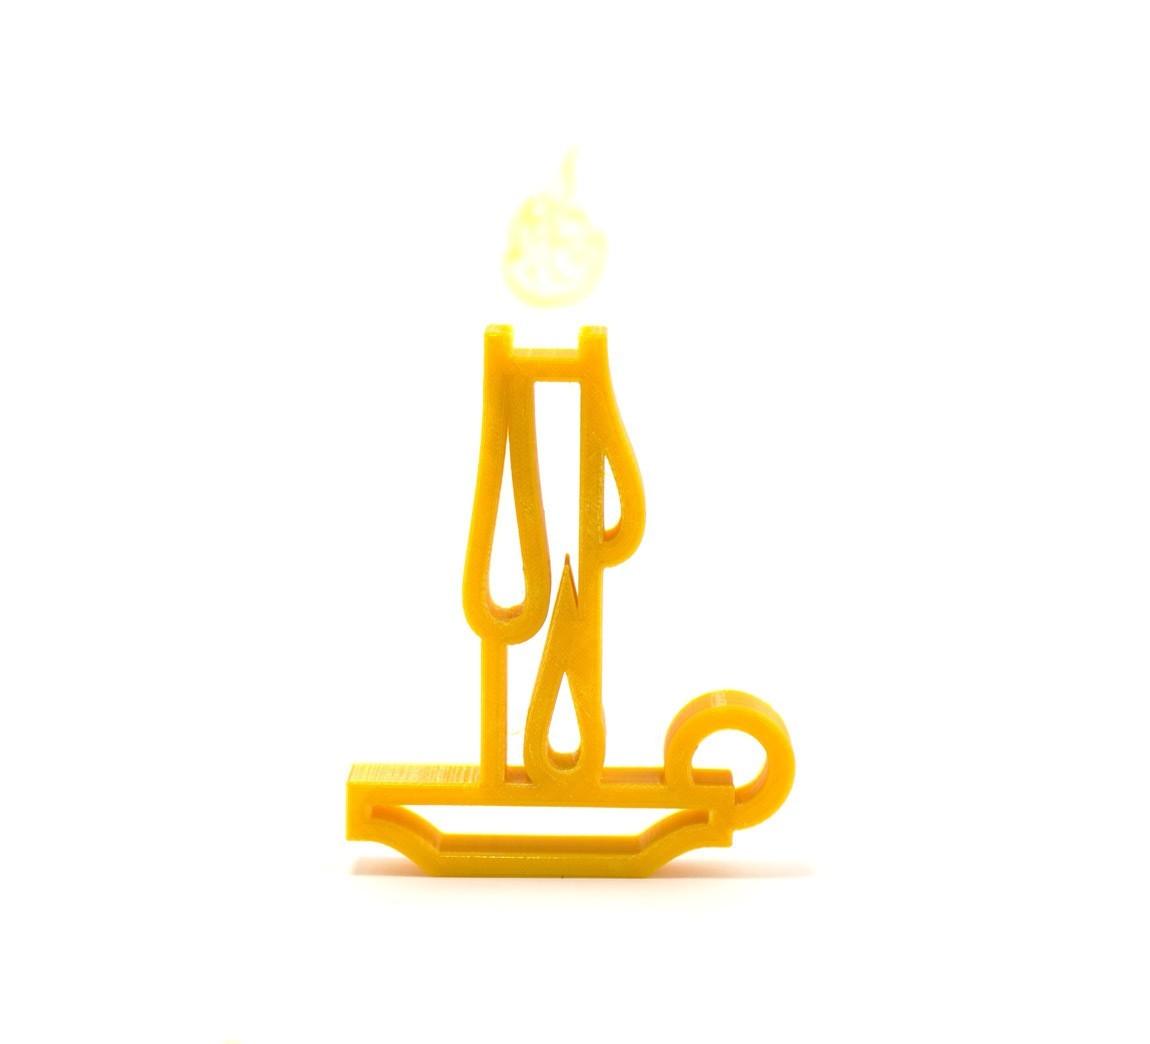 0a31d9f809a25b08eb38796c3457cf39_1450461087629_NMD000903-8.jpg Download free STL file LED Candlestick • 3D print template, Hom3d